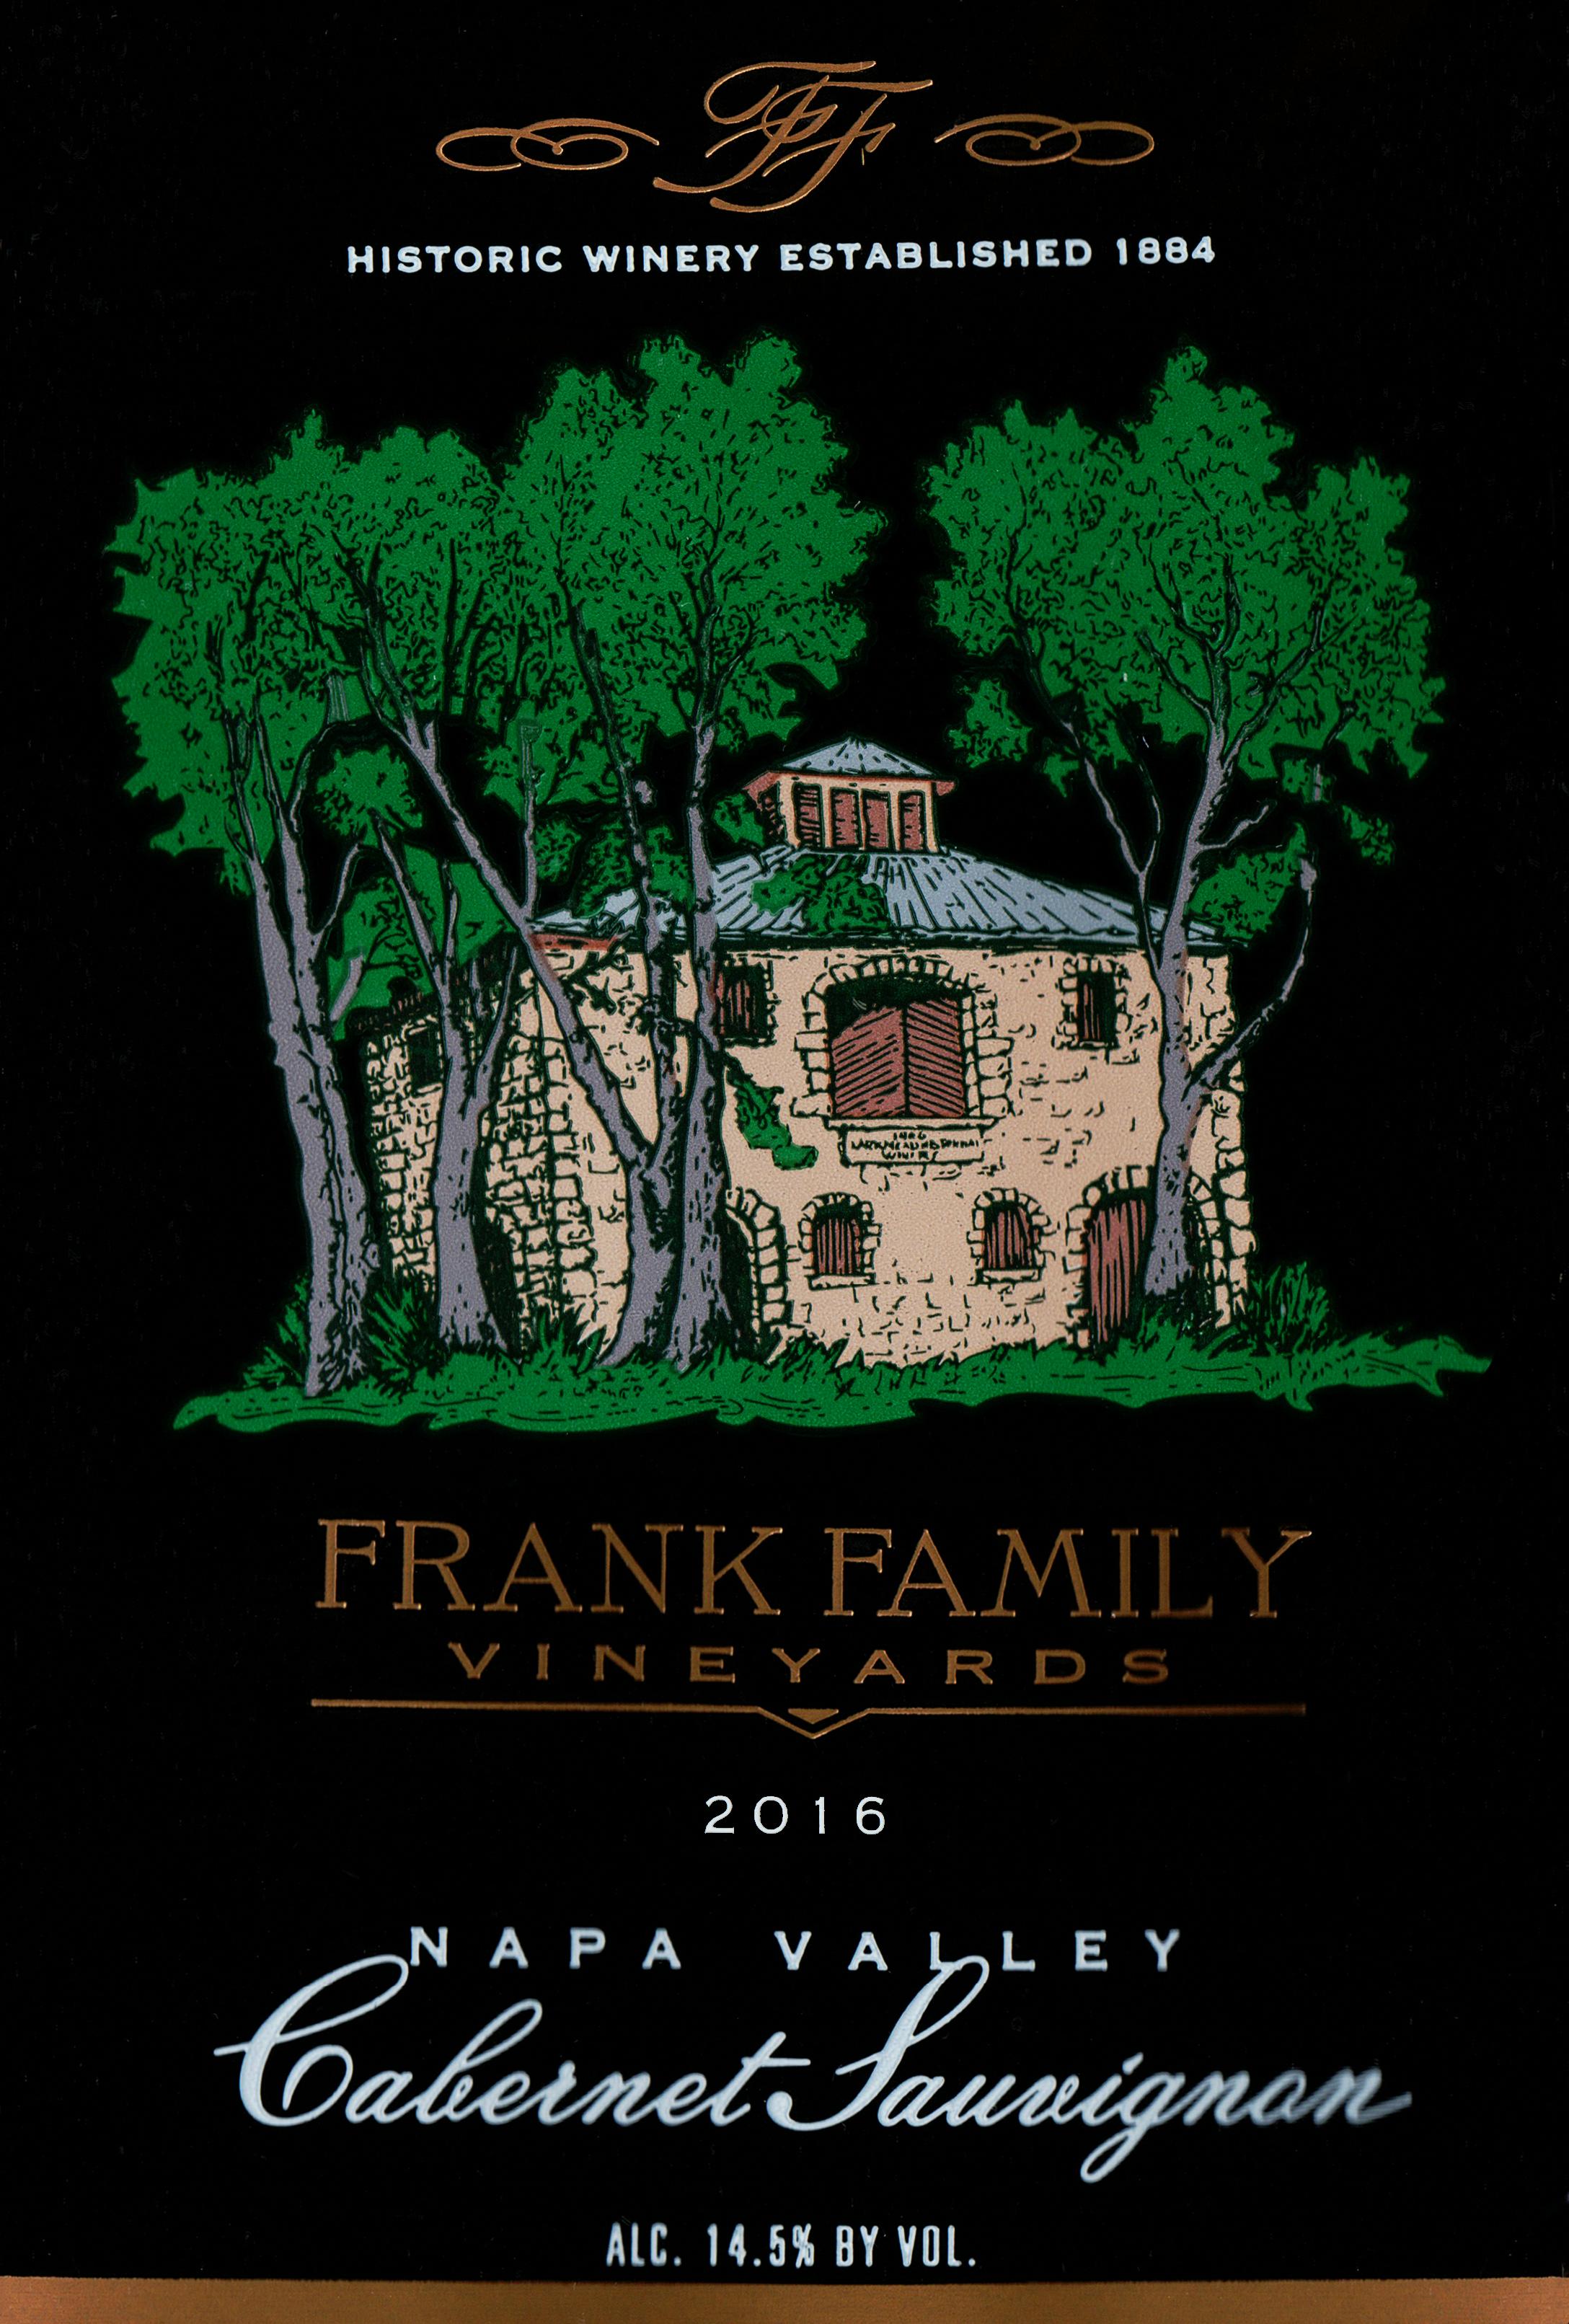 Frank Family Vineyards Cabernet Sauvignon 2016